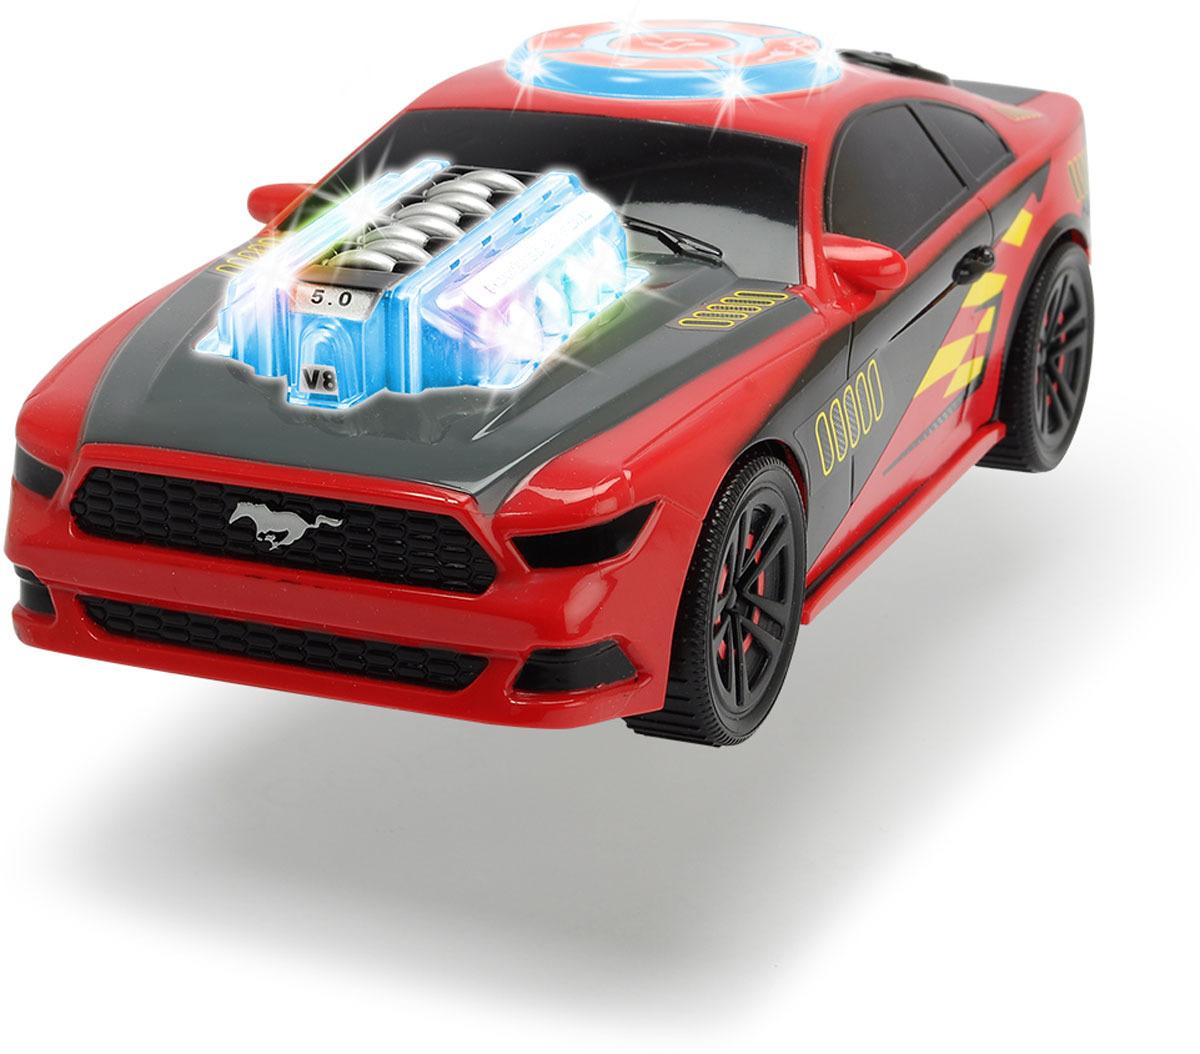 Машинка Dickie Toys Racing. Музыкальный гонщик, 23 см dickie toys звук акс